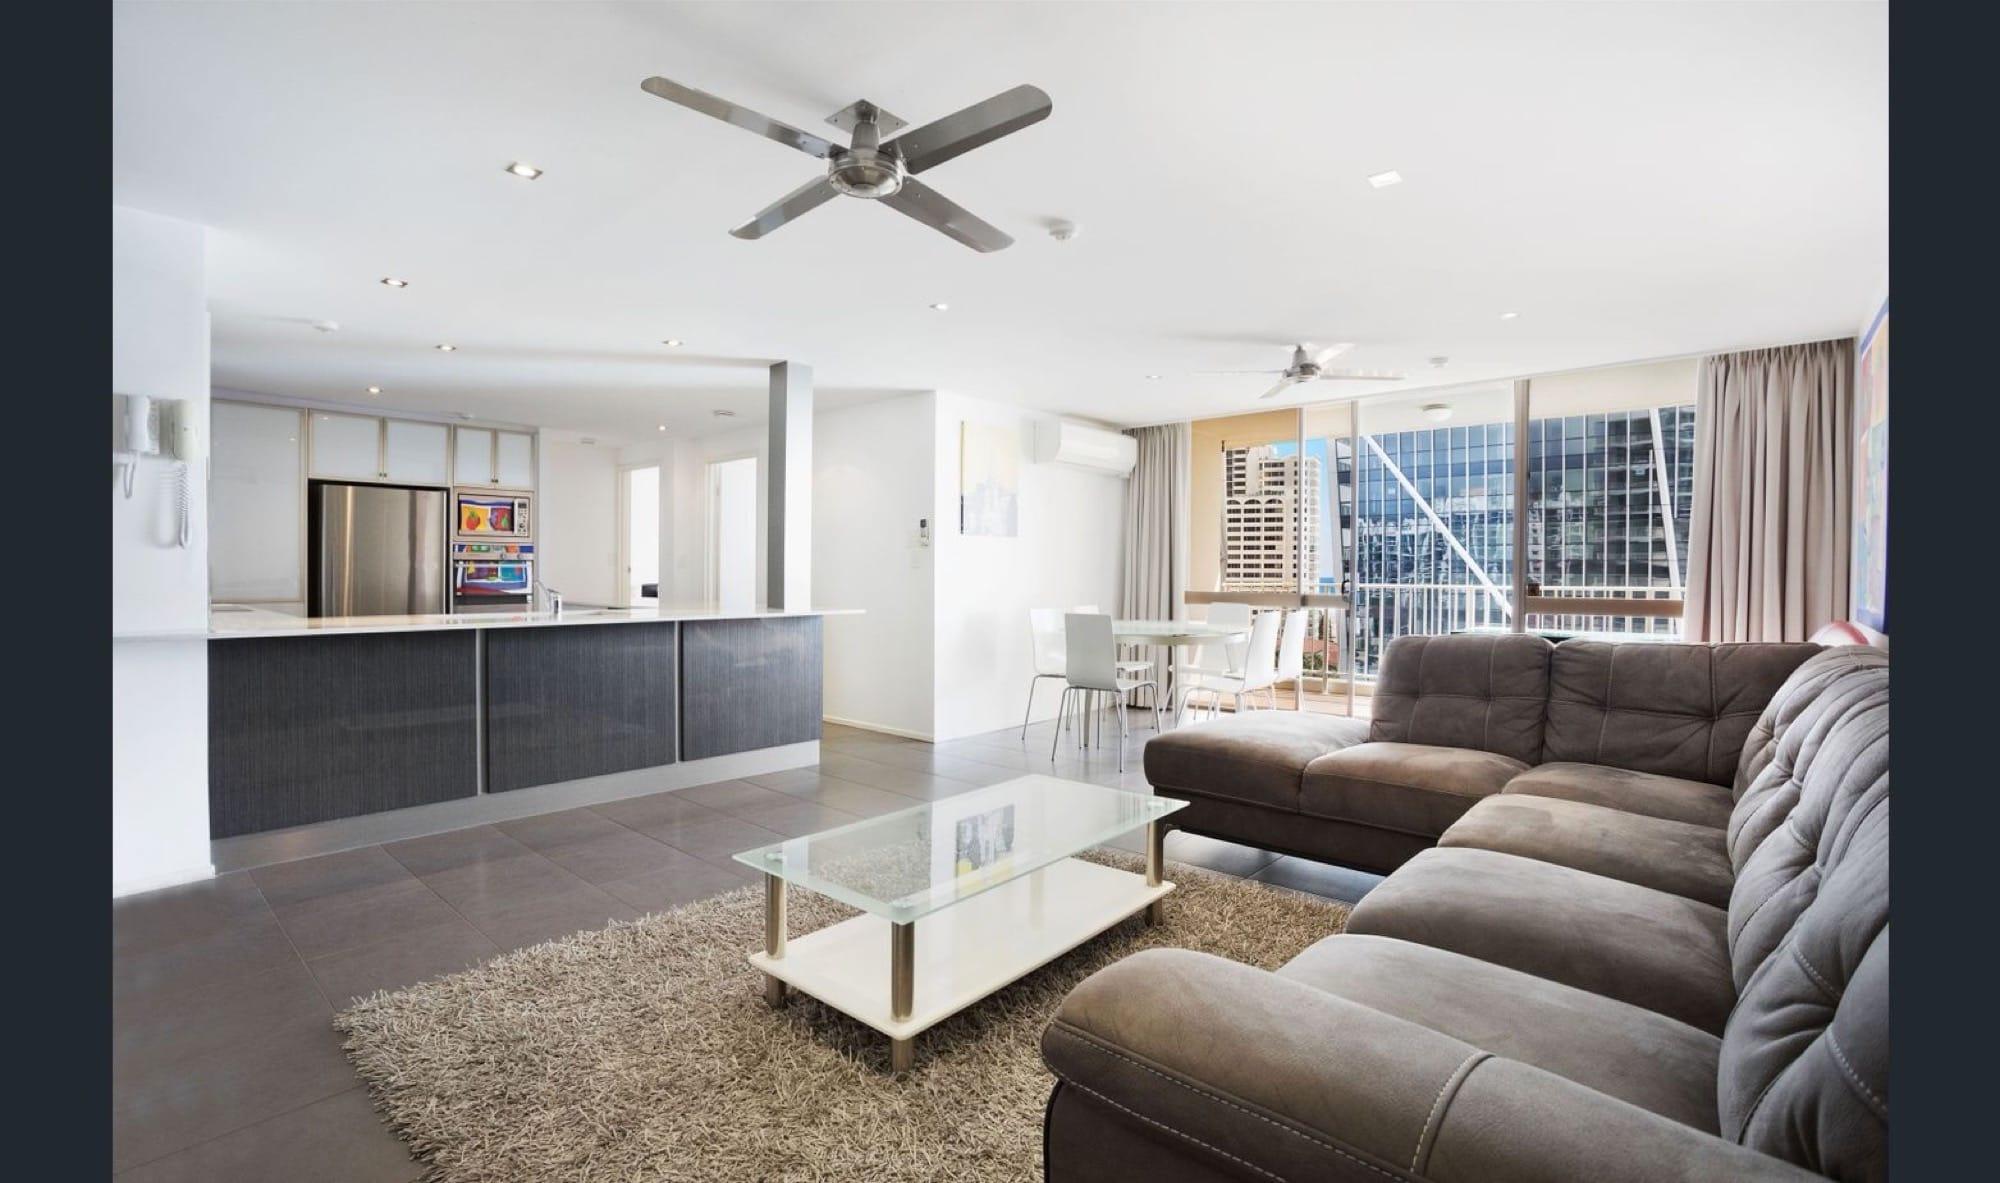 apartment-breakers-north-11d-1